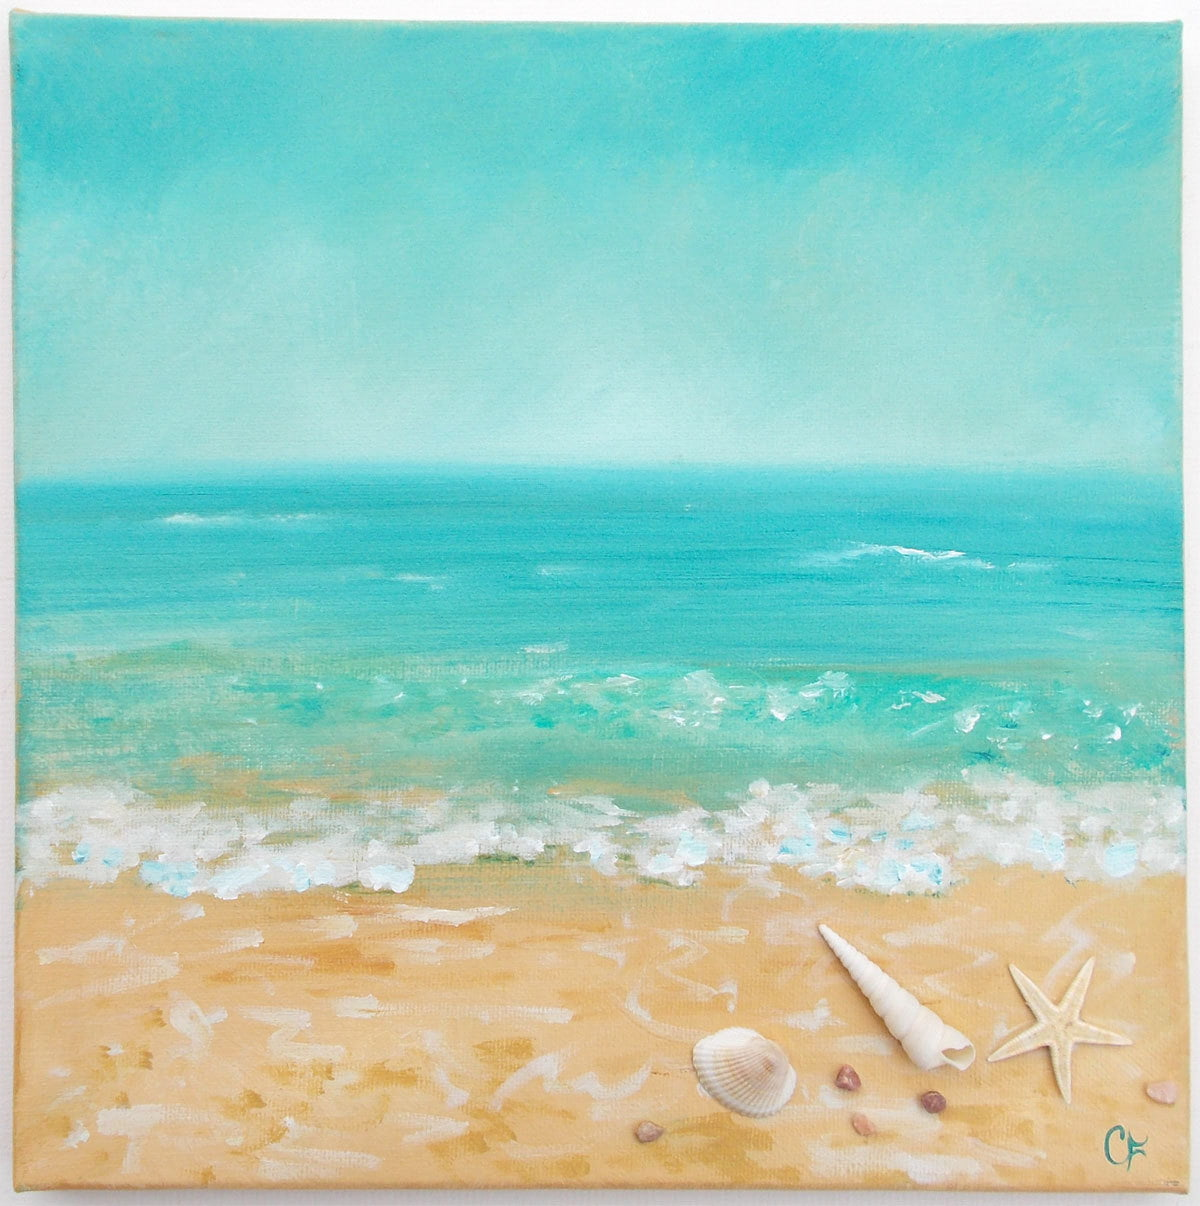 playa verano dibujo